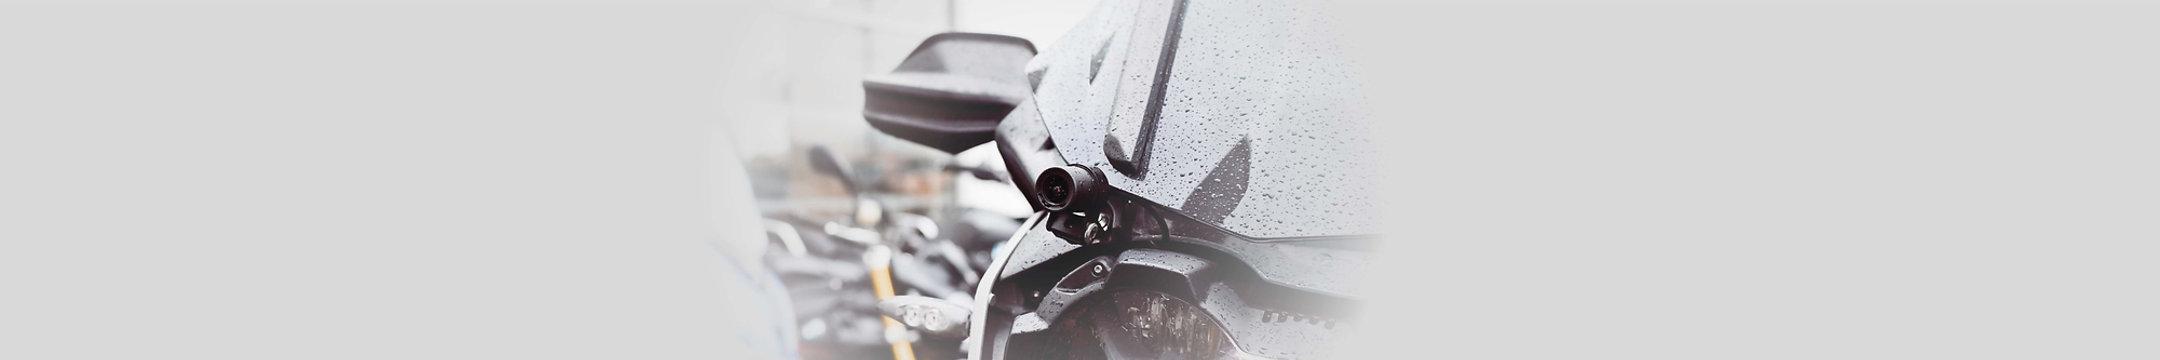 INNOVV Motorcycle dashcam on BMW